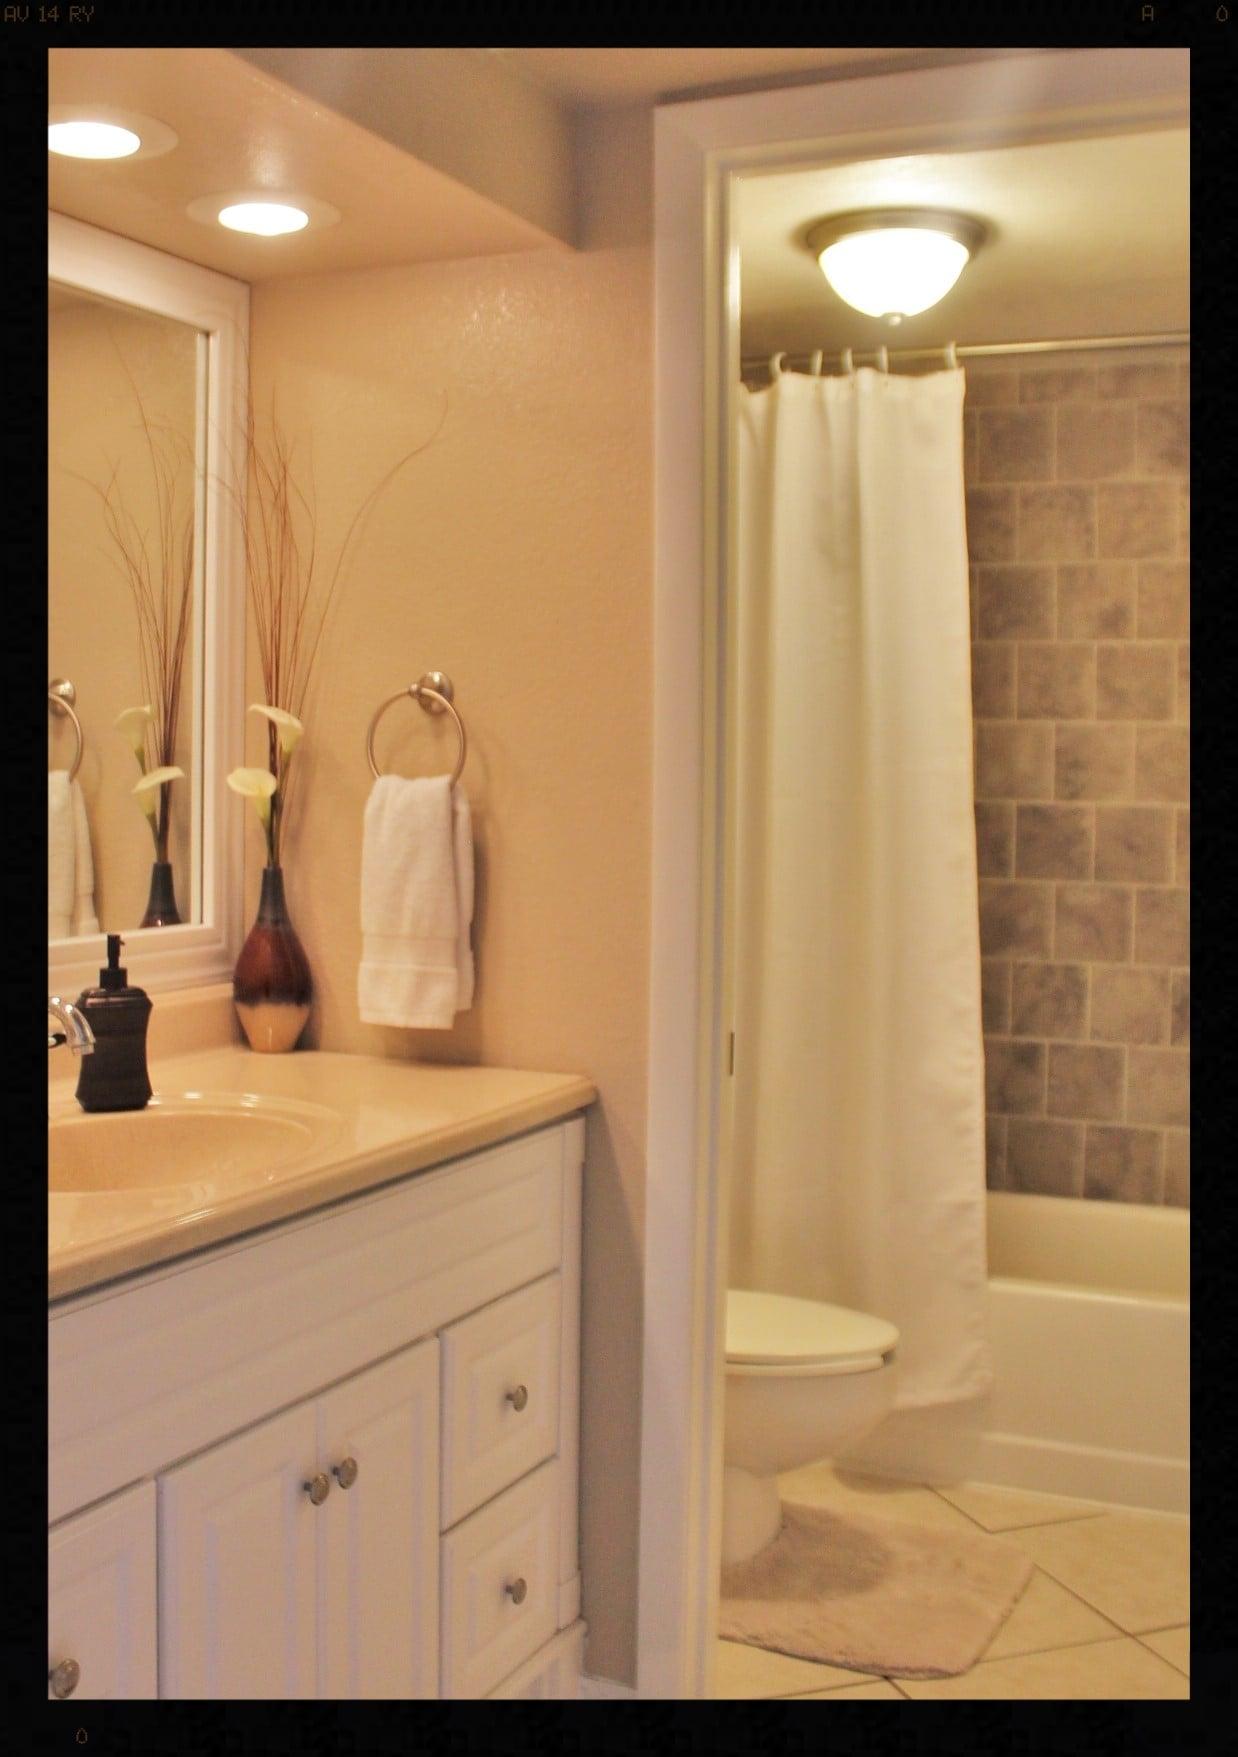 sink and shower 2.JPG